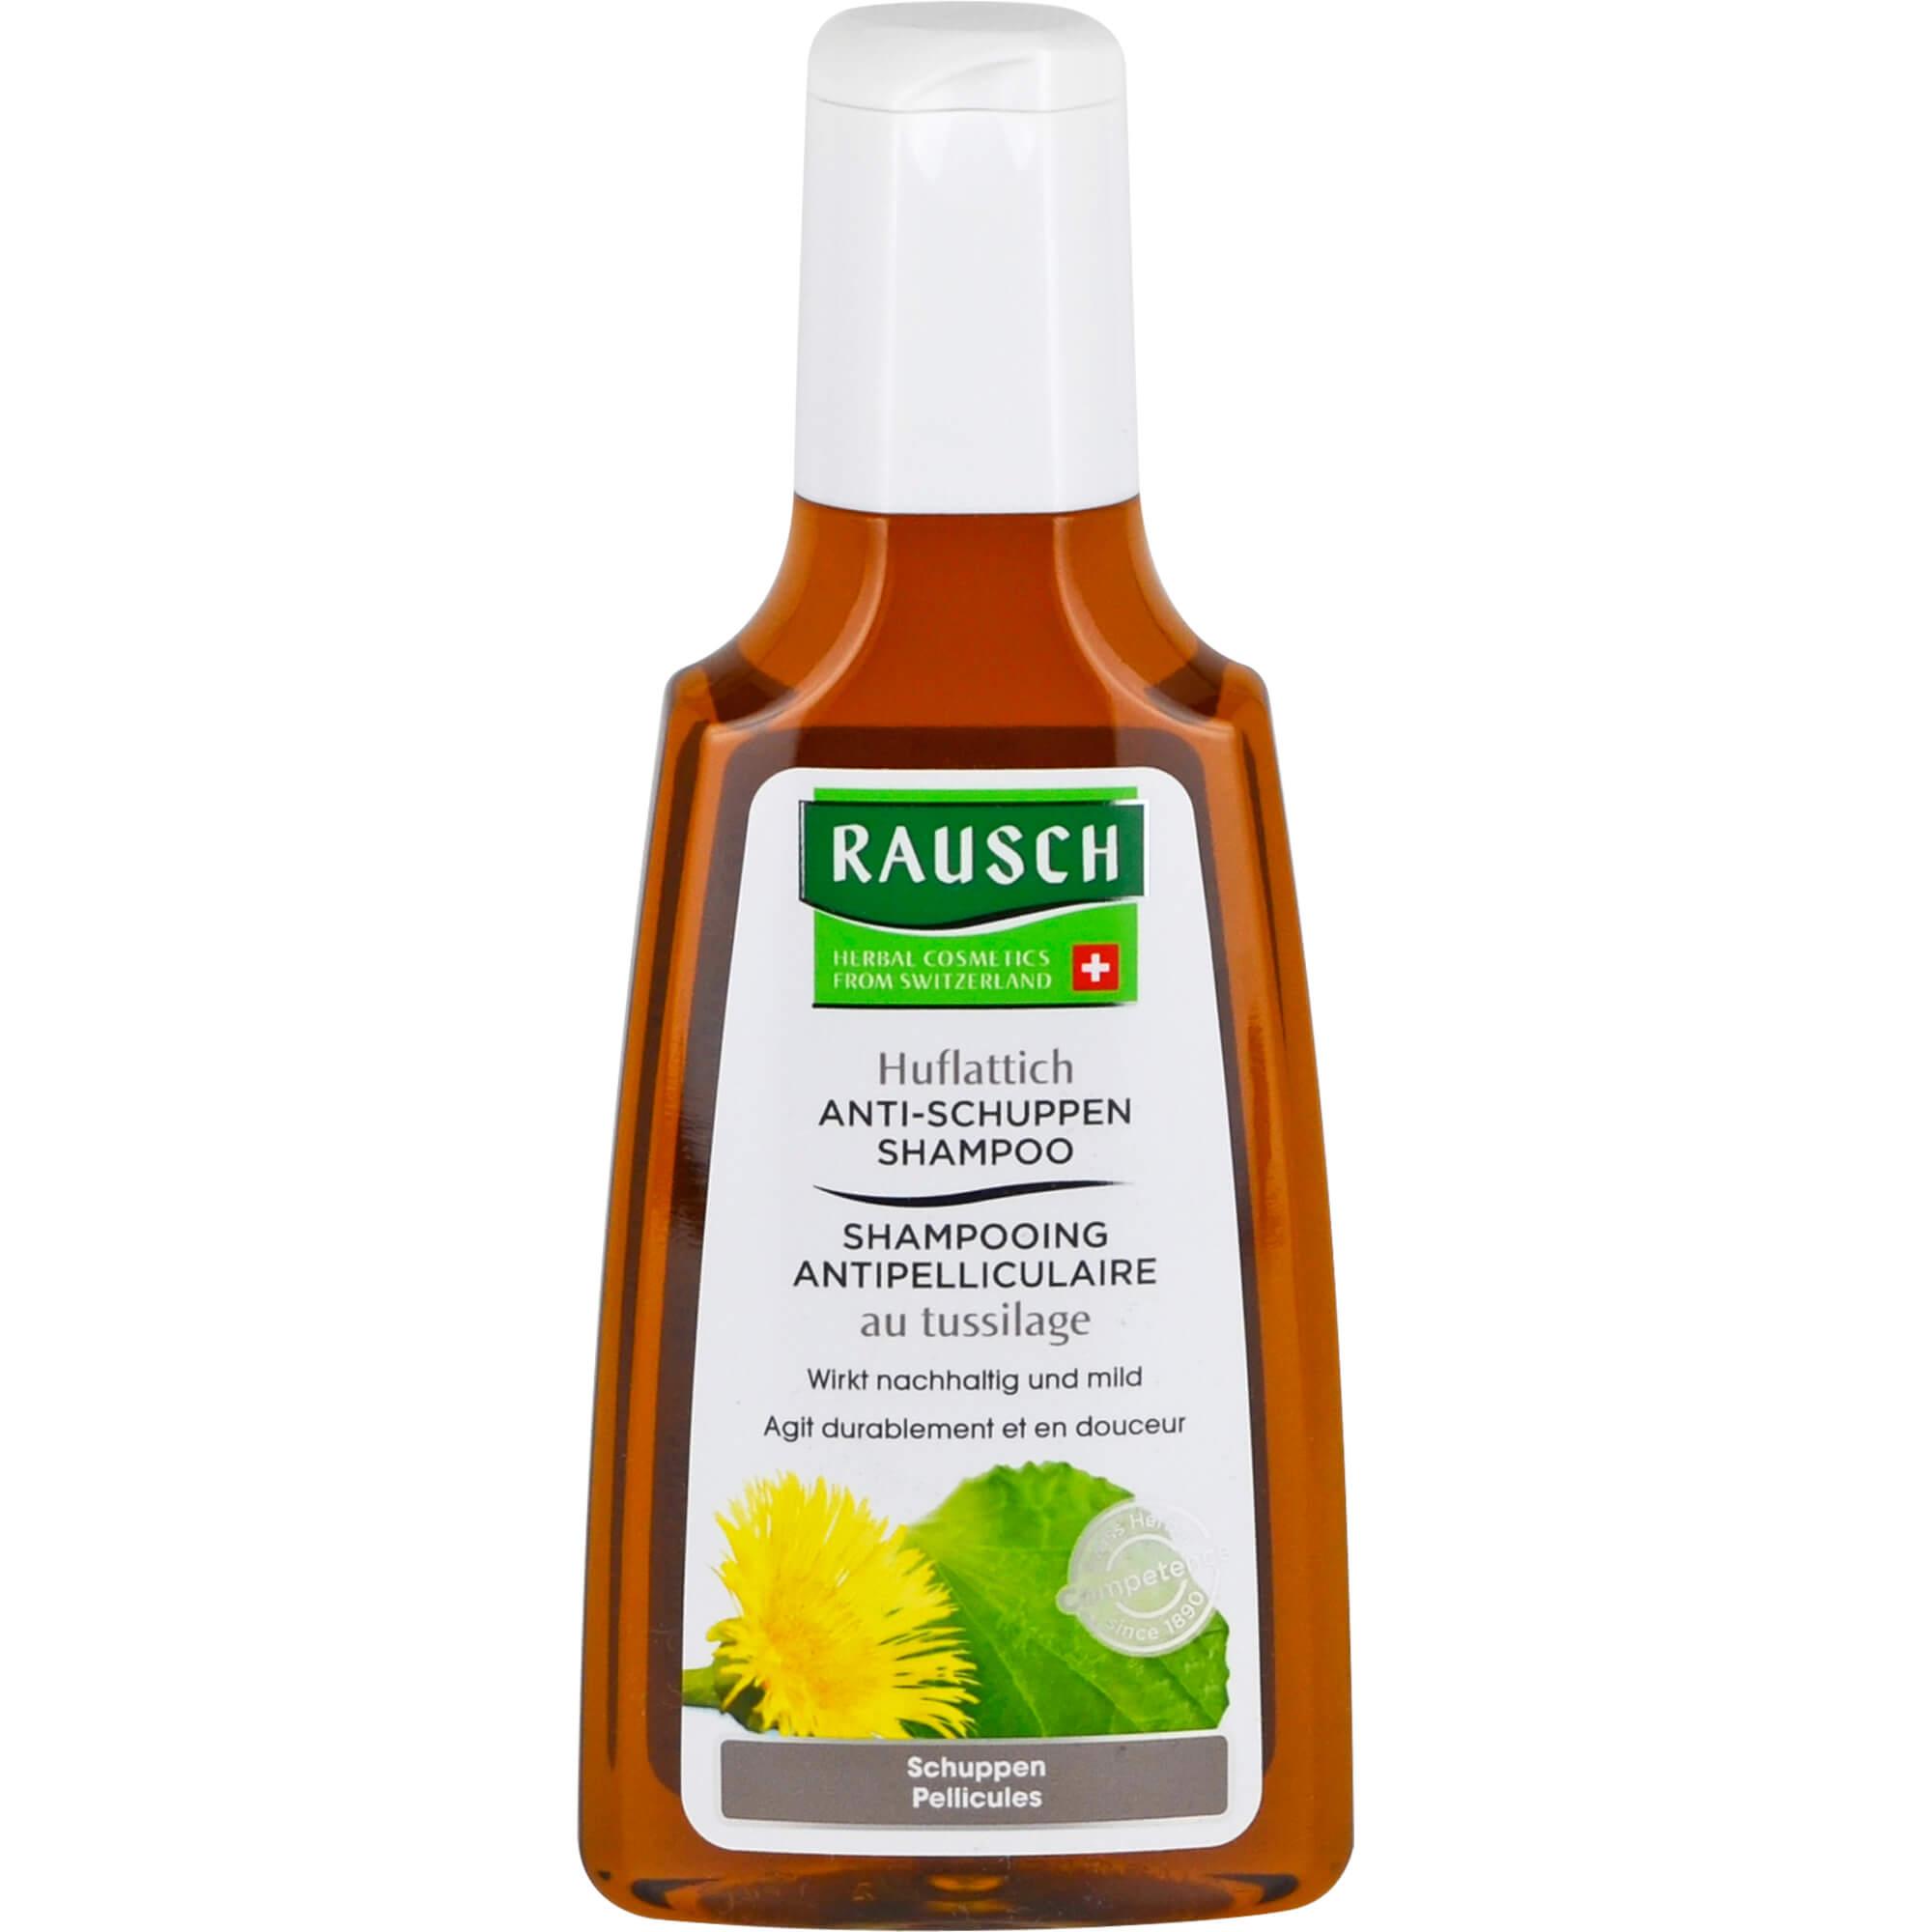 RAUSCH Huflattich Anti-Schuppen Shampoo